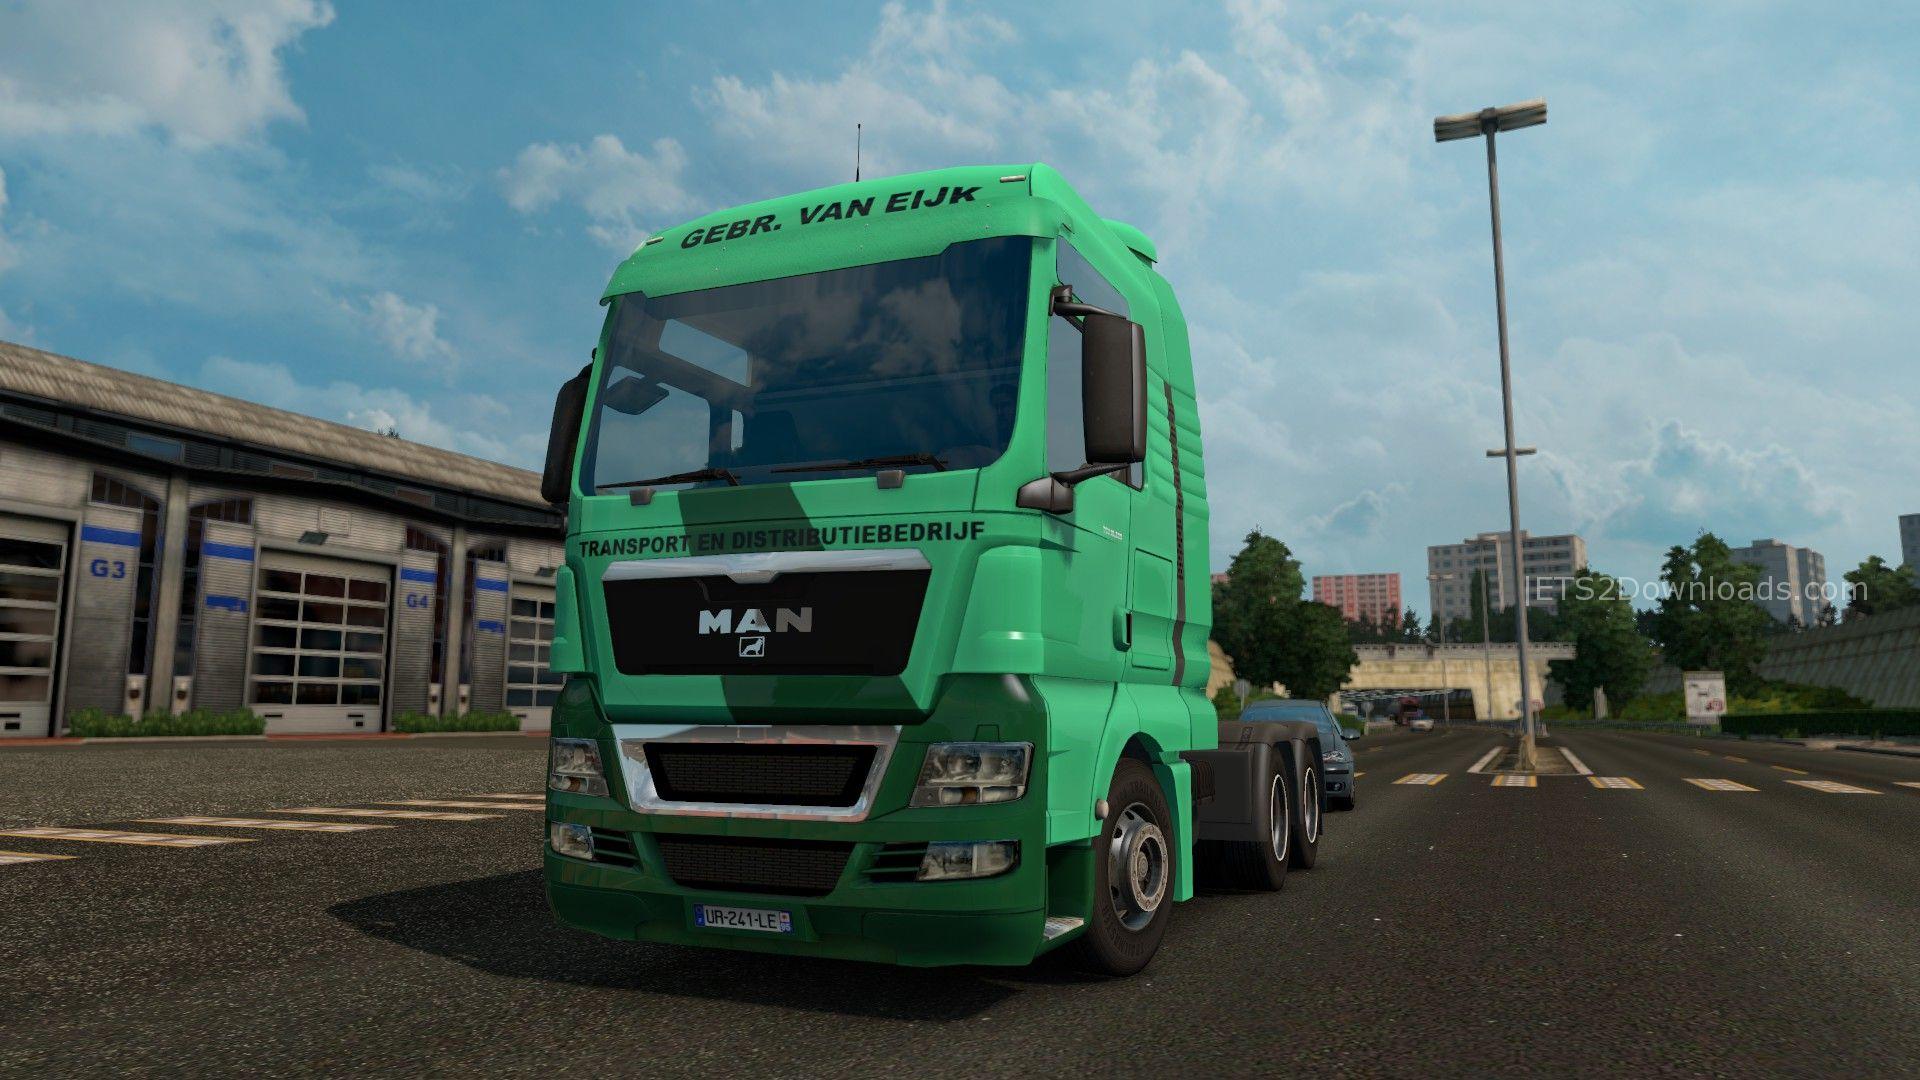 van-eijk-transport-skin-for-man-tgx